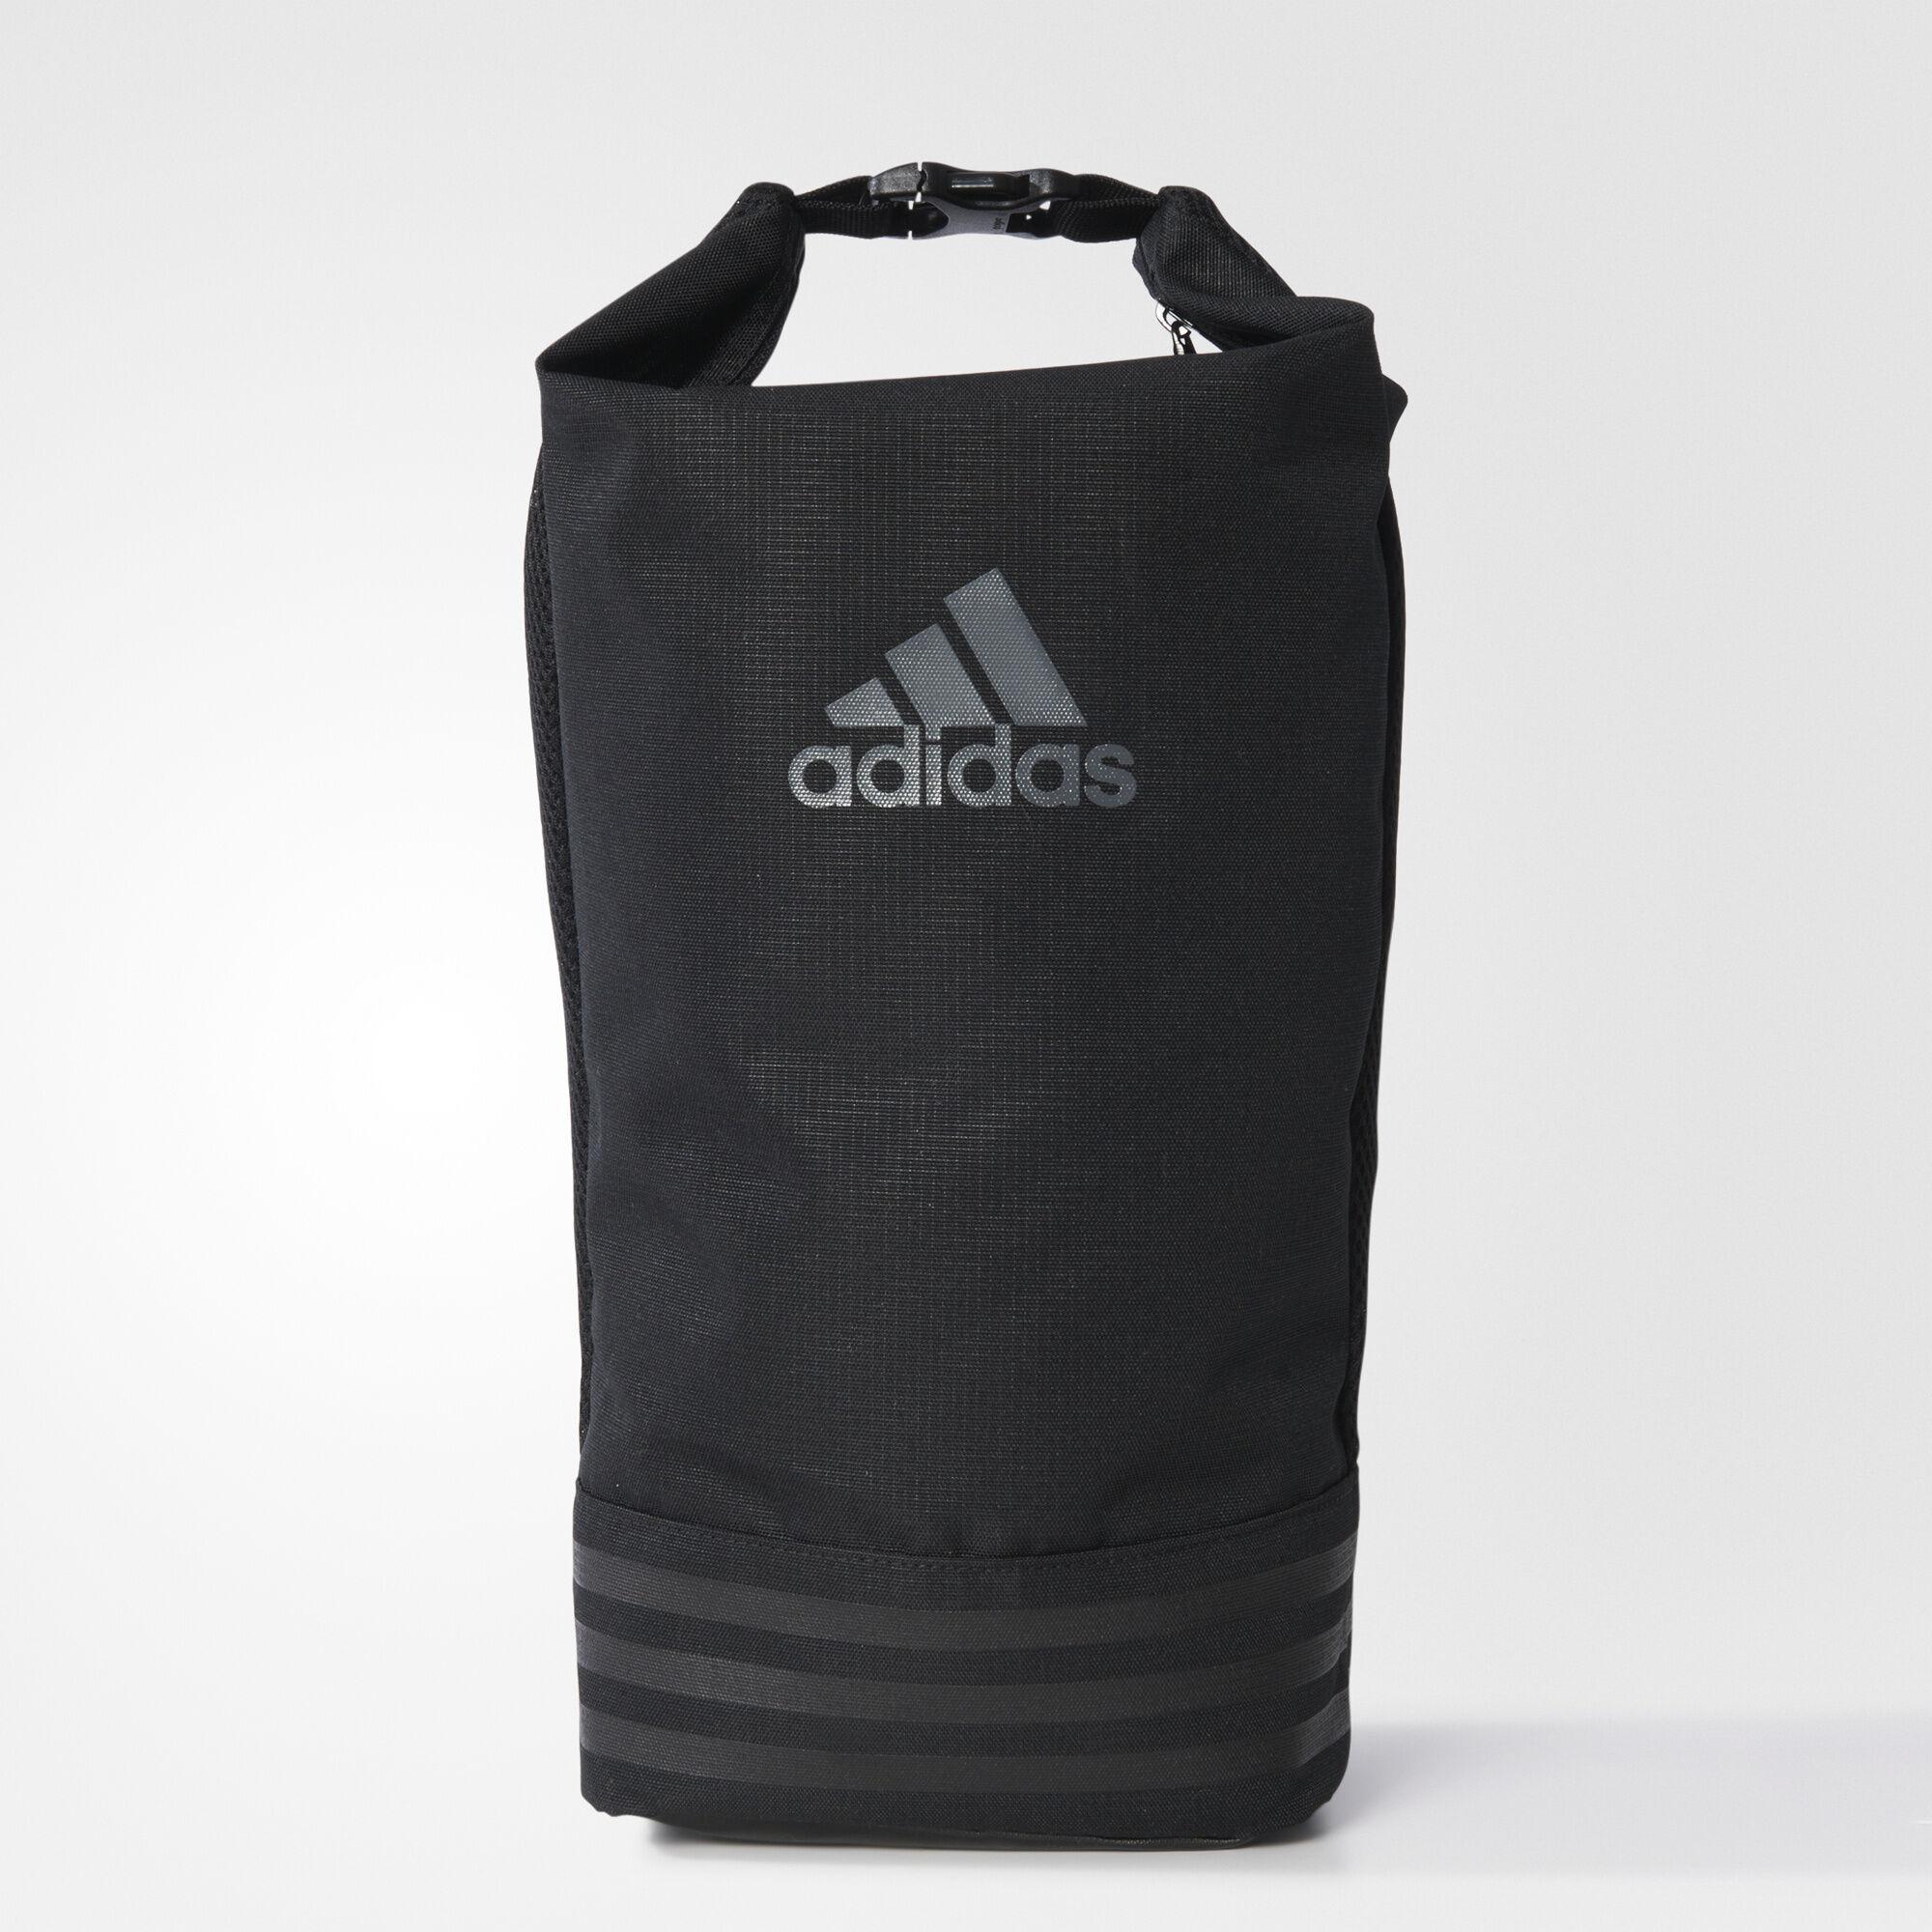 2dffd011ed Adidas Shoe Bag Related Keywords   Suggestions - Adidas Shoe Bag ...